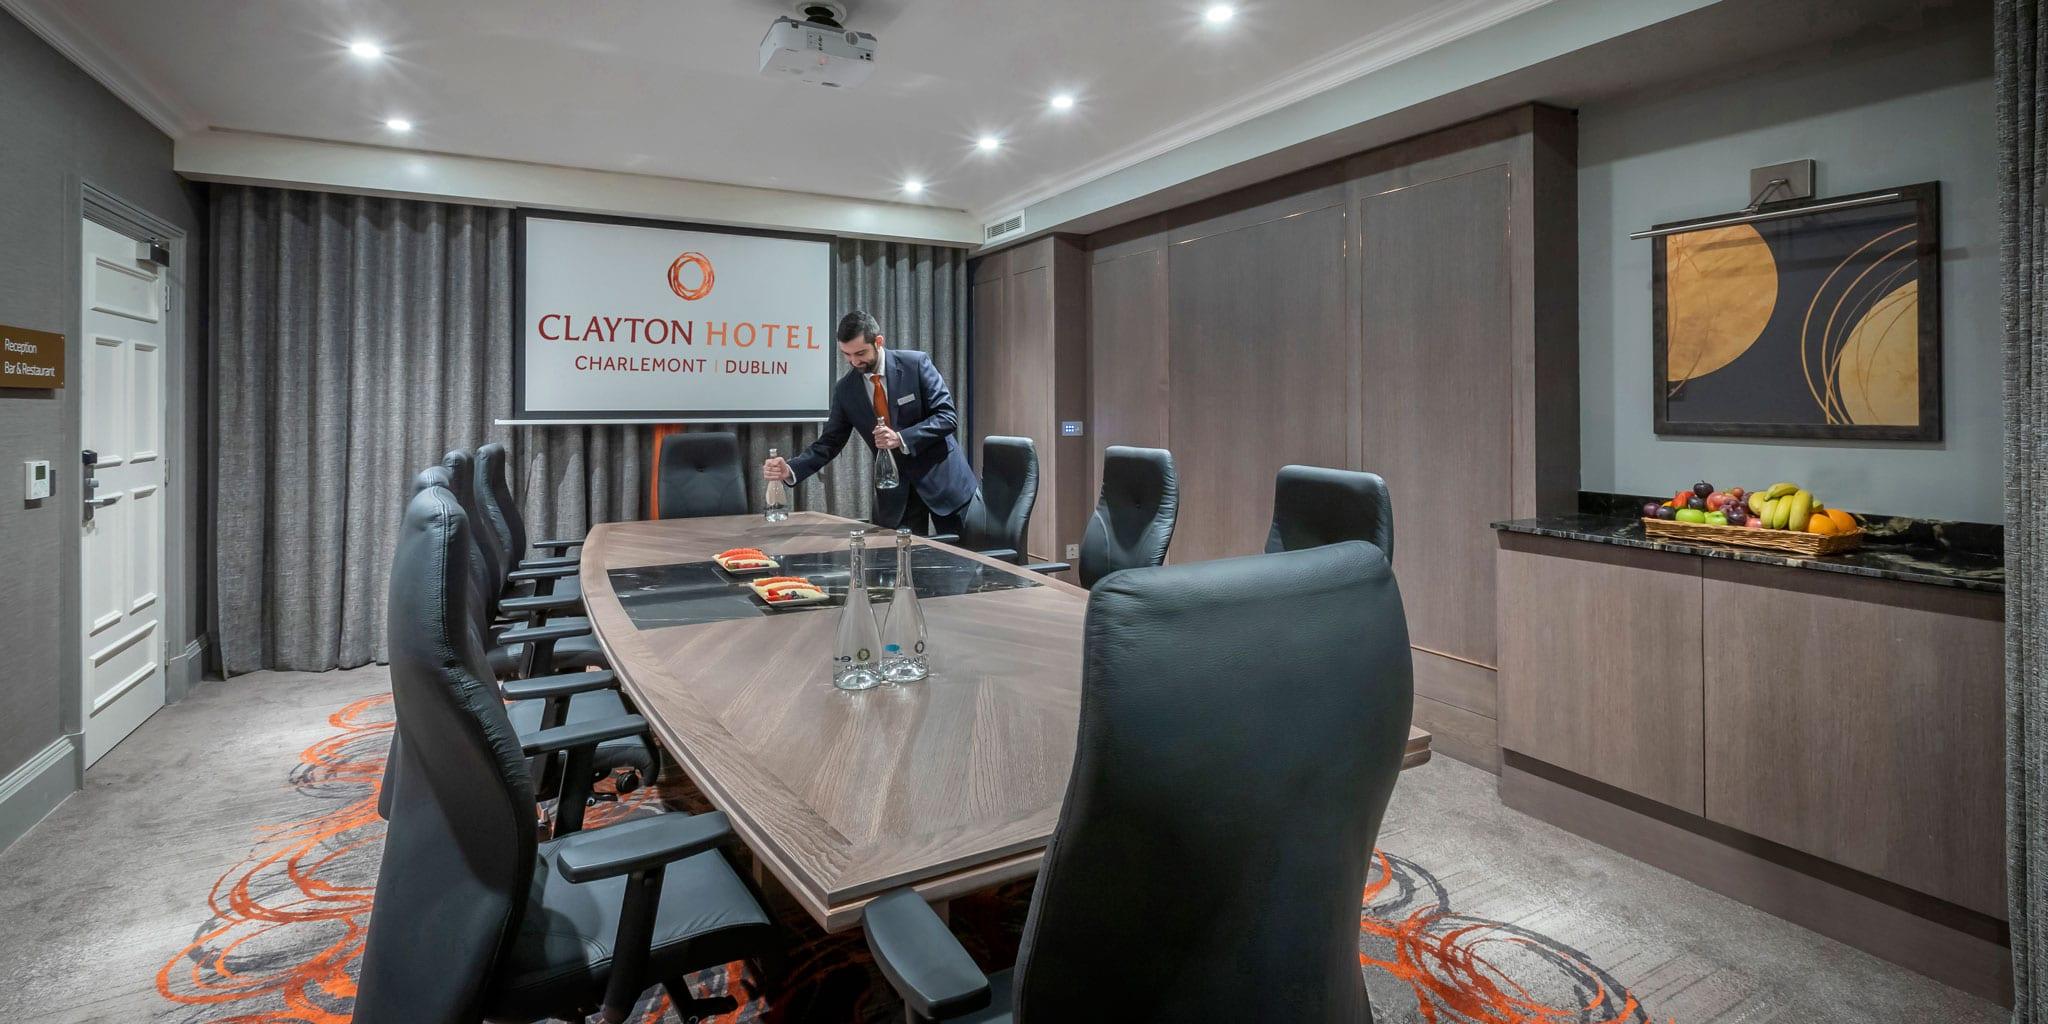 Boardroom at Clayton Hotel Charlemont